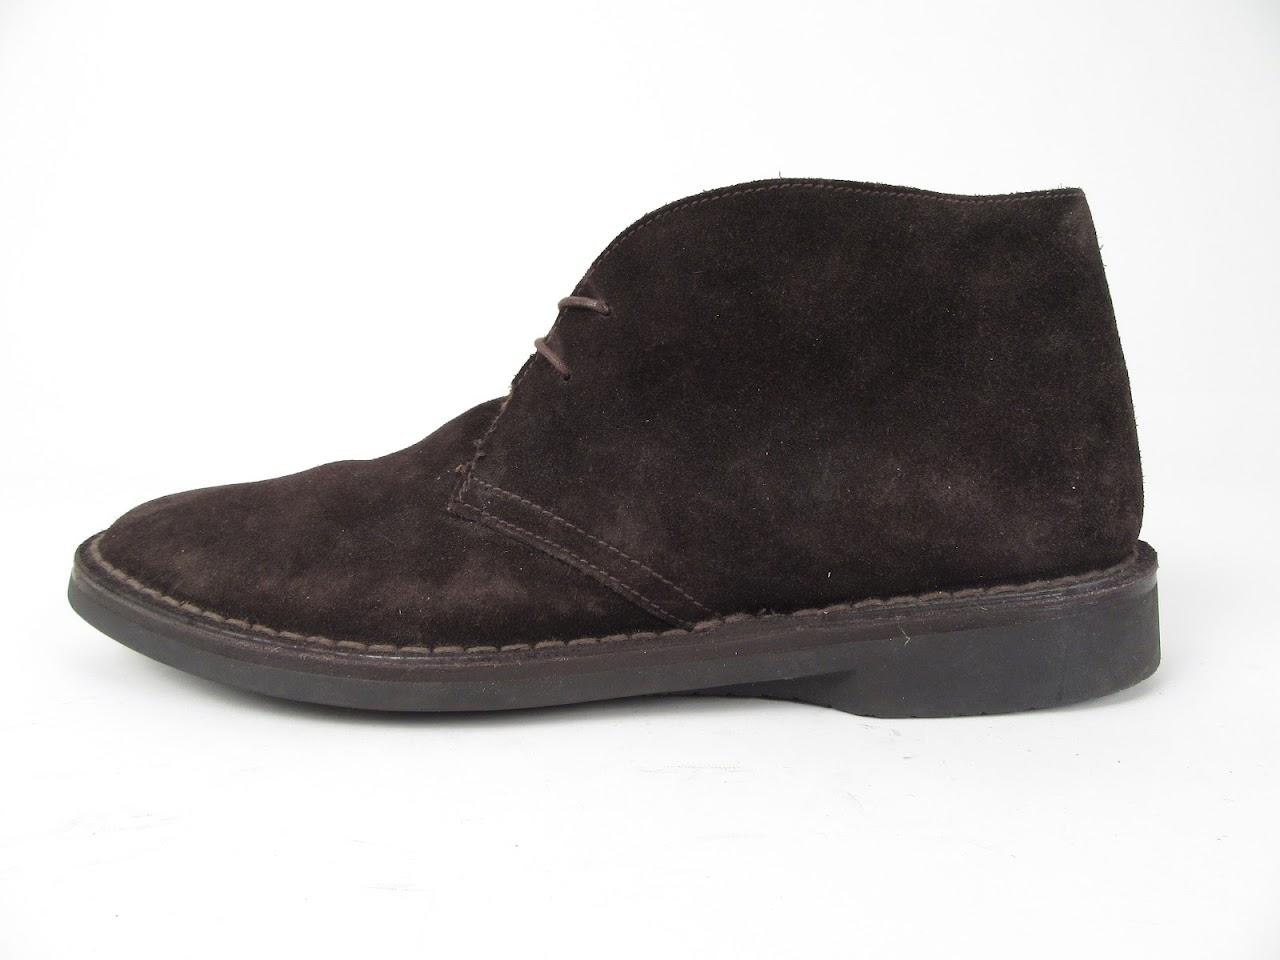 Prada Brown Suede Chukka Boot